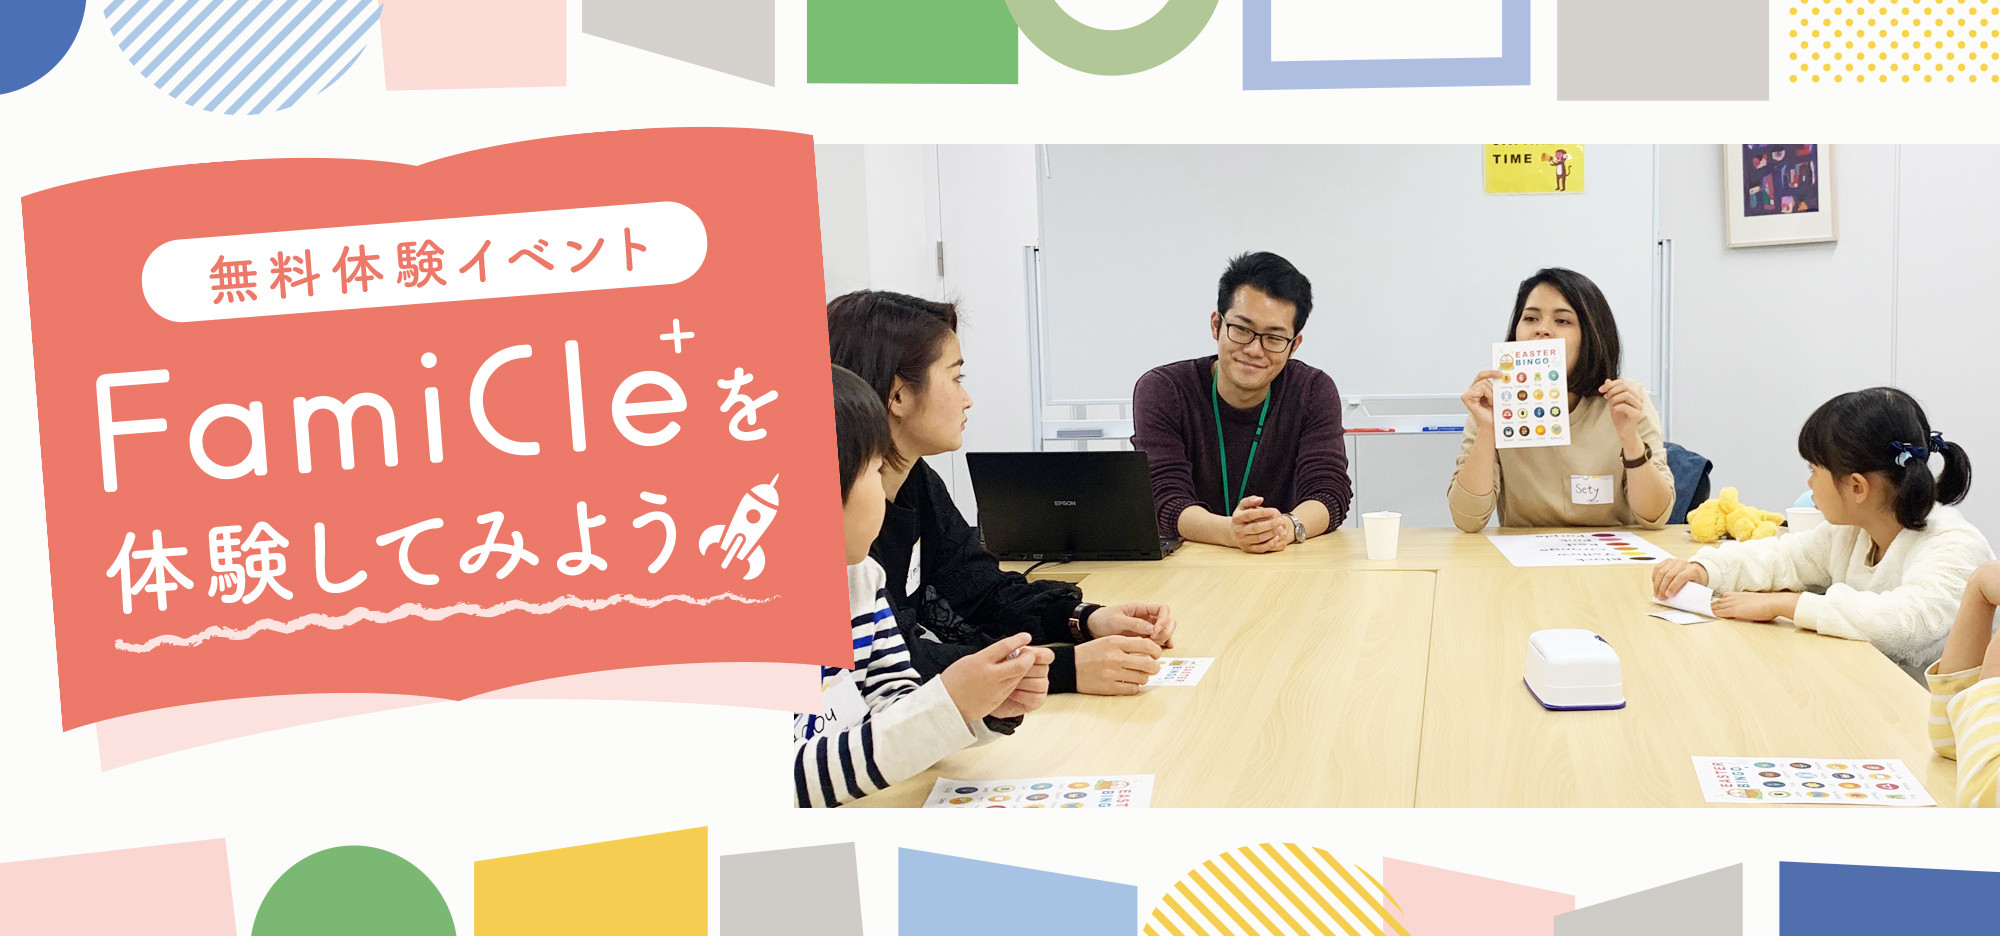 FamiCle+説明会